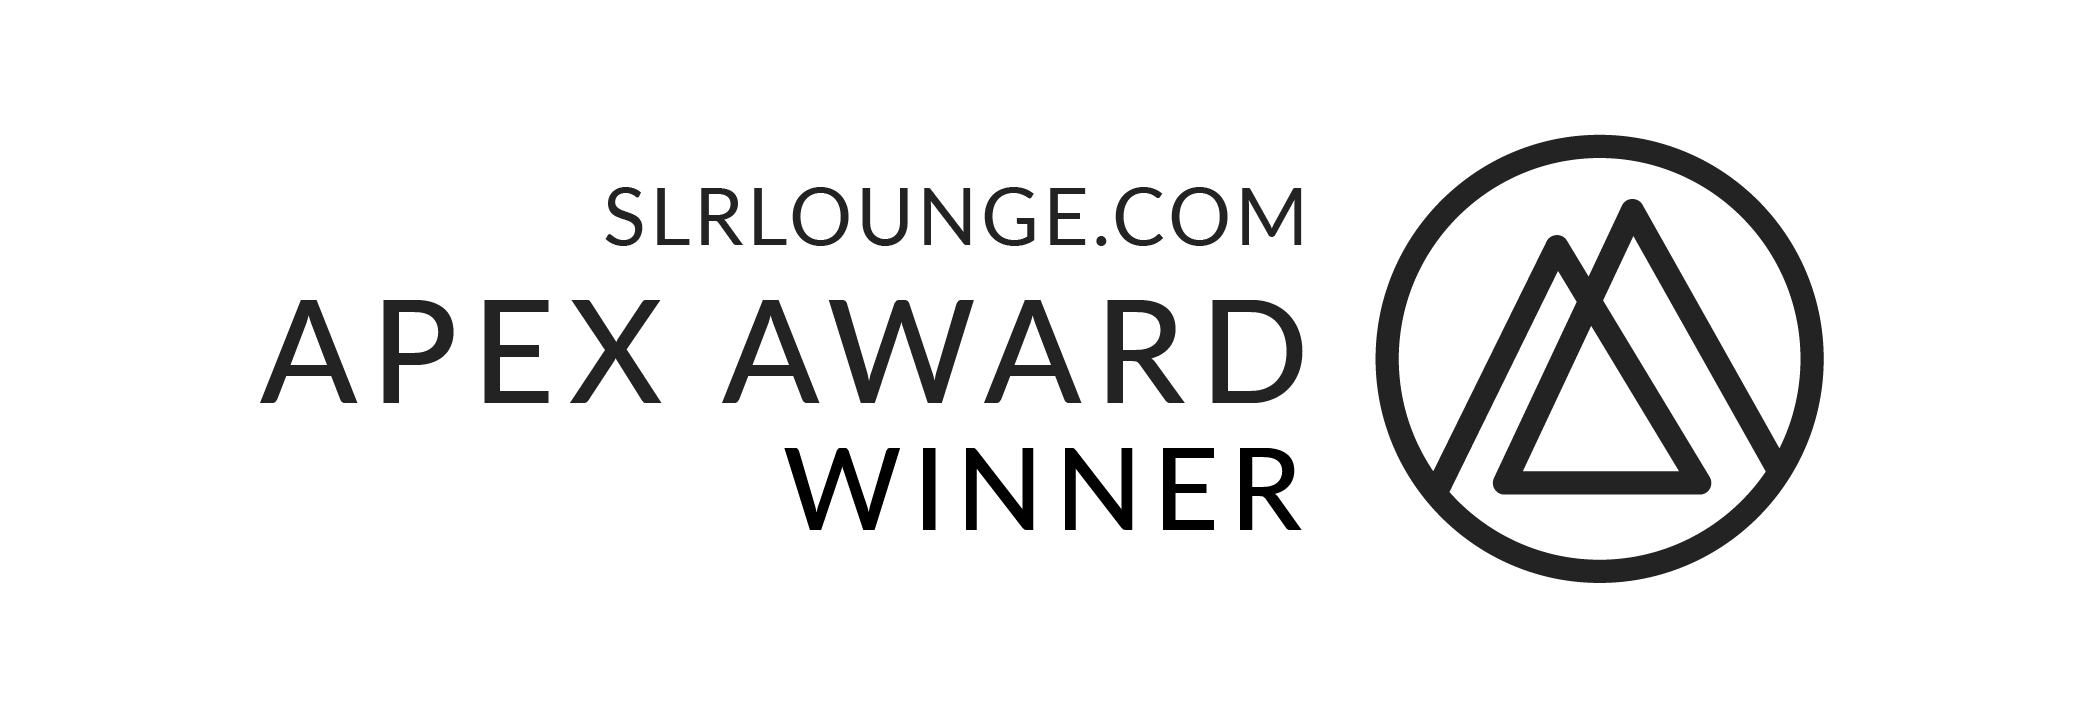 slr-lounge-apex-badge.png